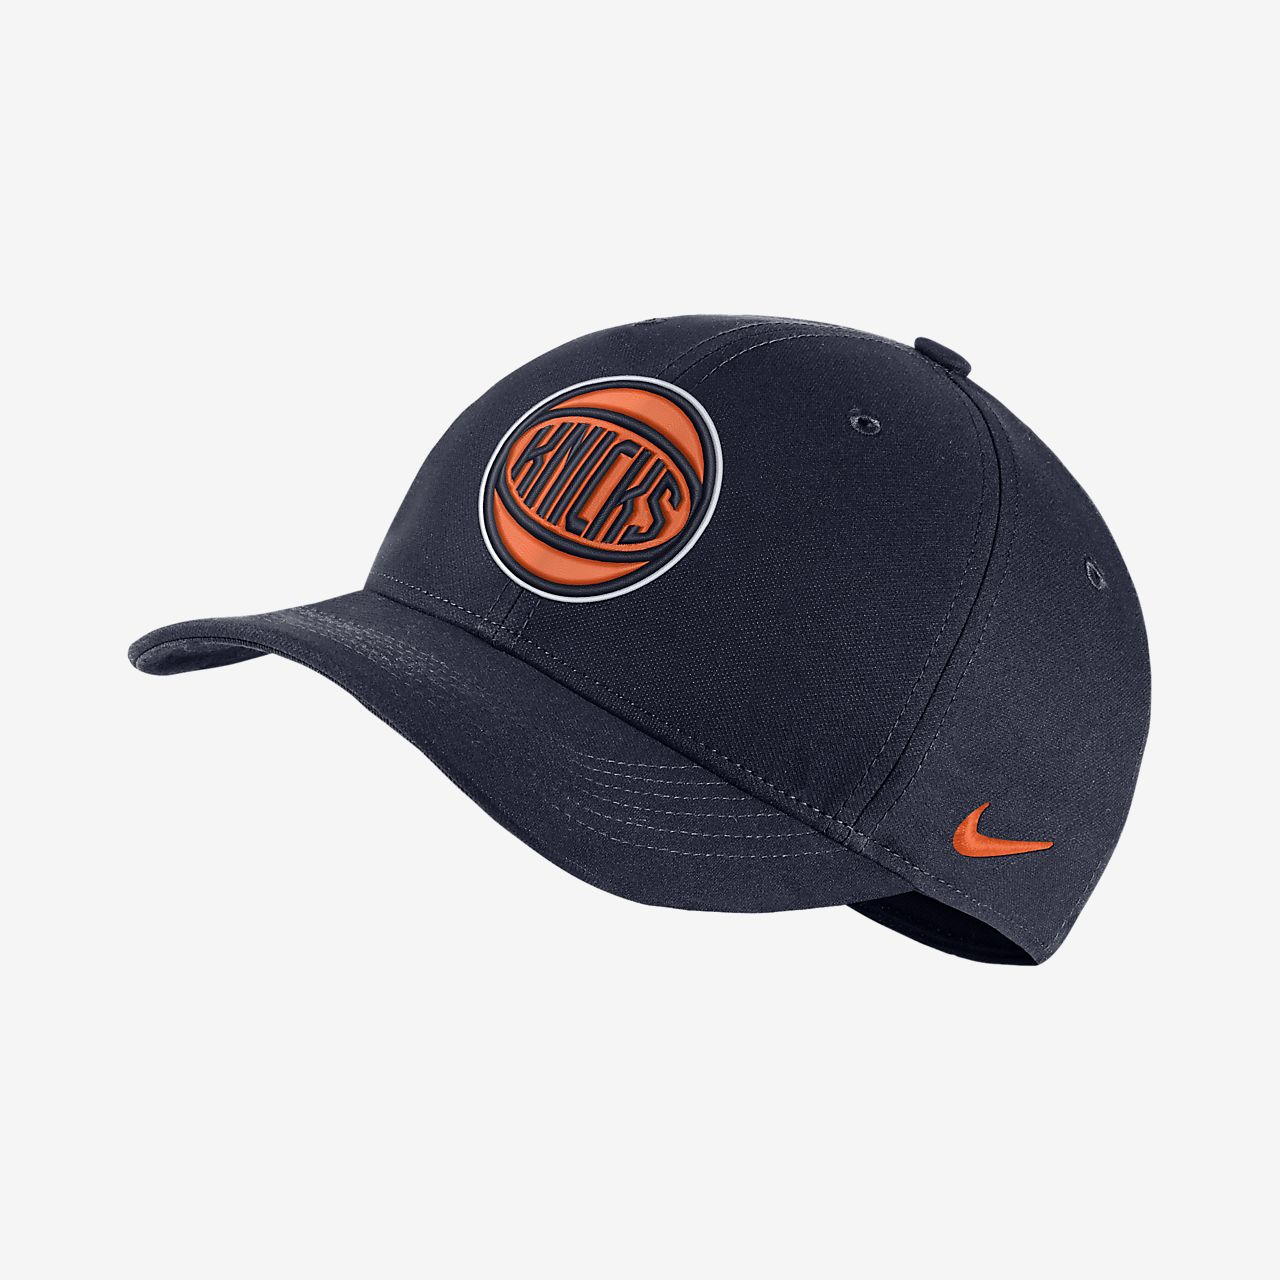 New York Knicks City Edition Nike AeroBill Classic99 Gorra de l'NBA